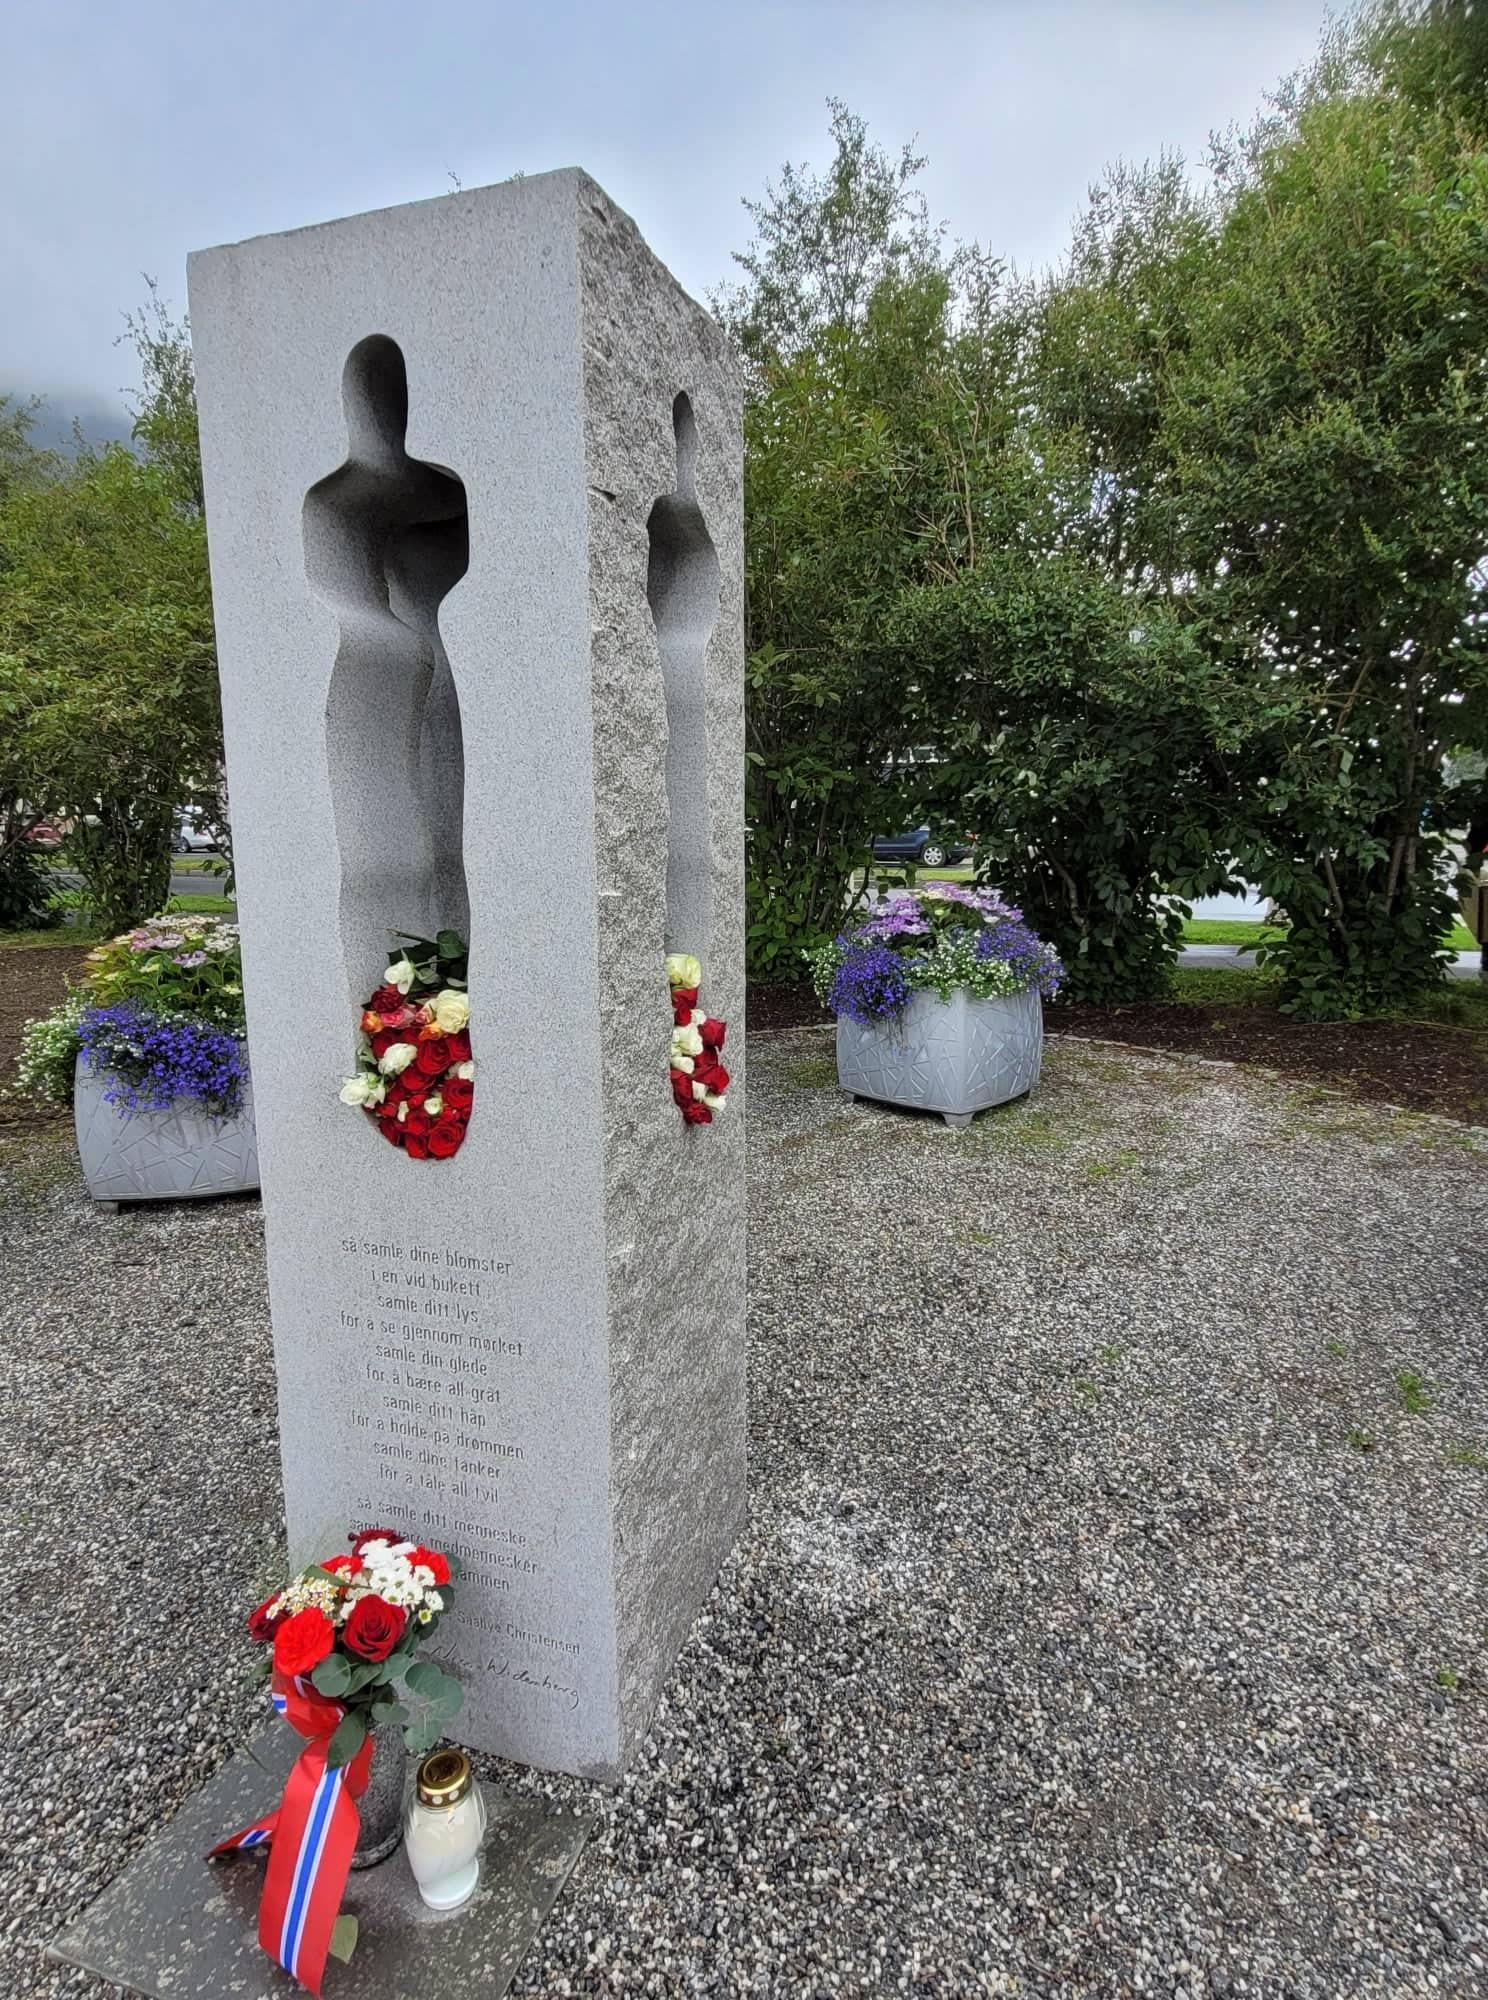 Minnesmerket 22. juli i byparken i Mosjøen